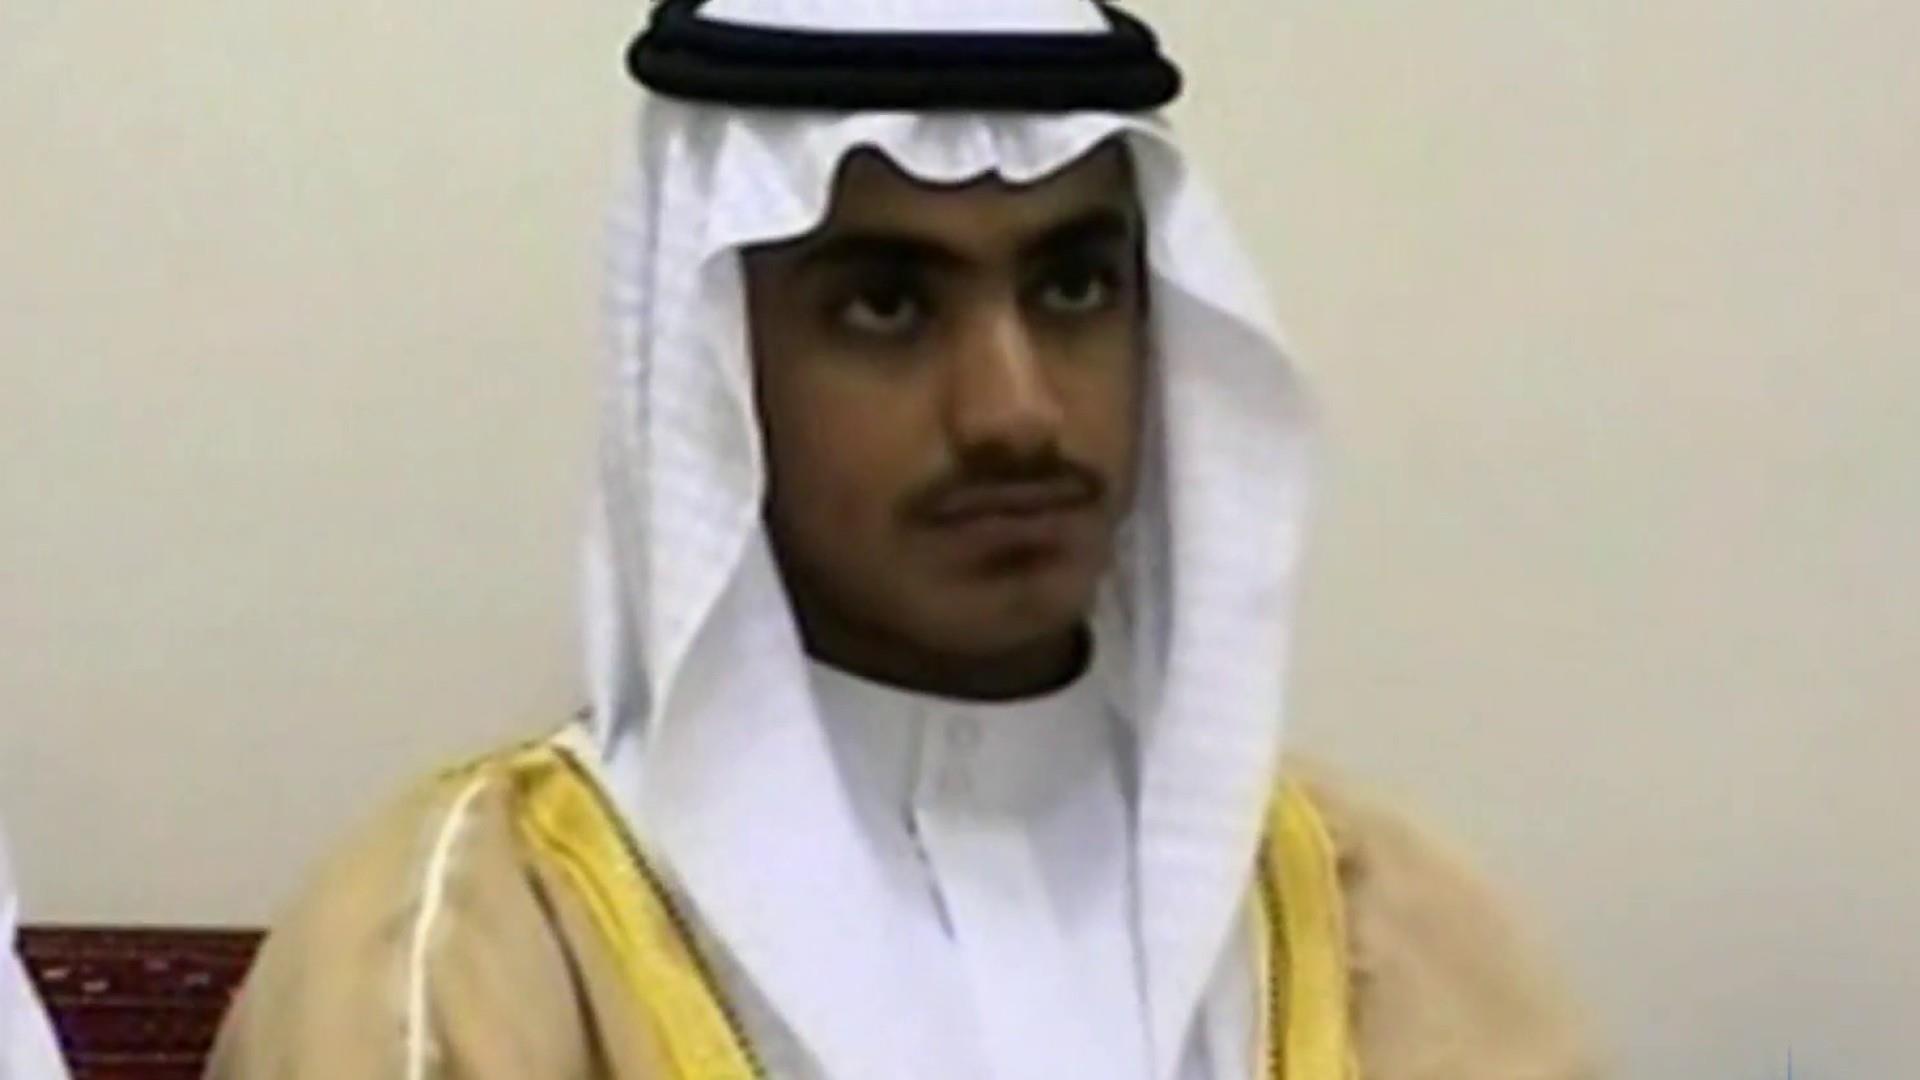 Trump confirms Osama bin Laden's son Hamza killed in U.S. operation